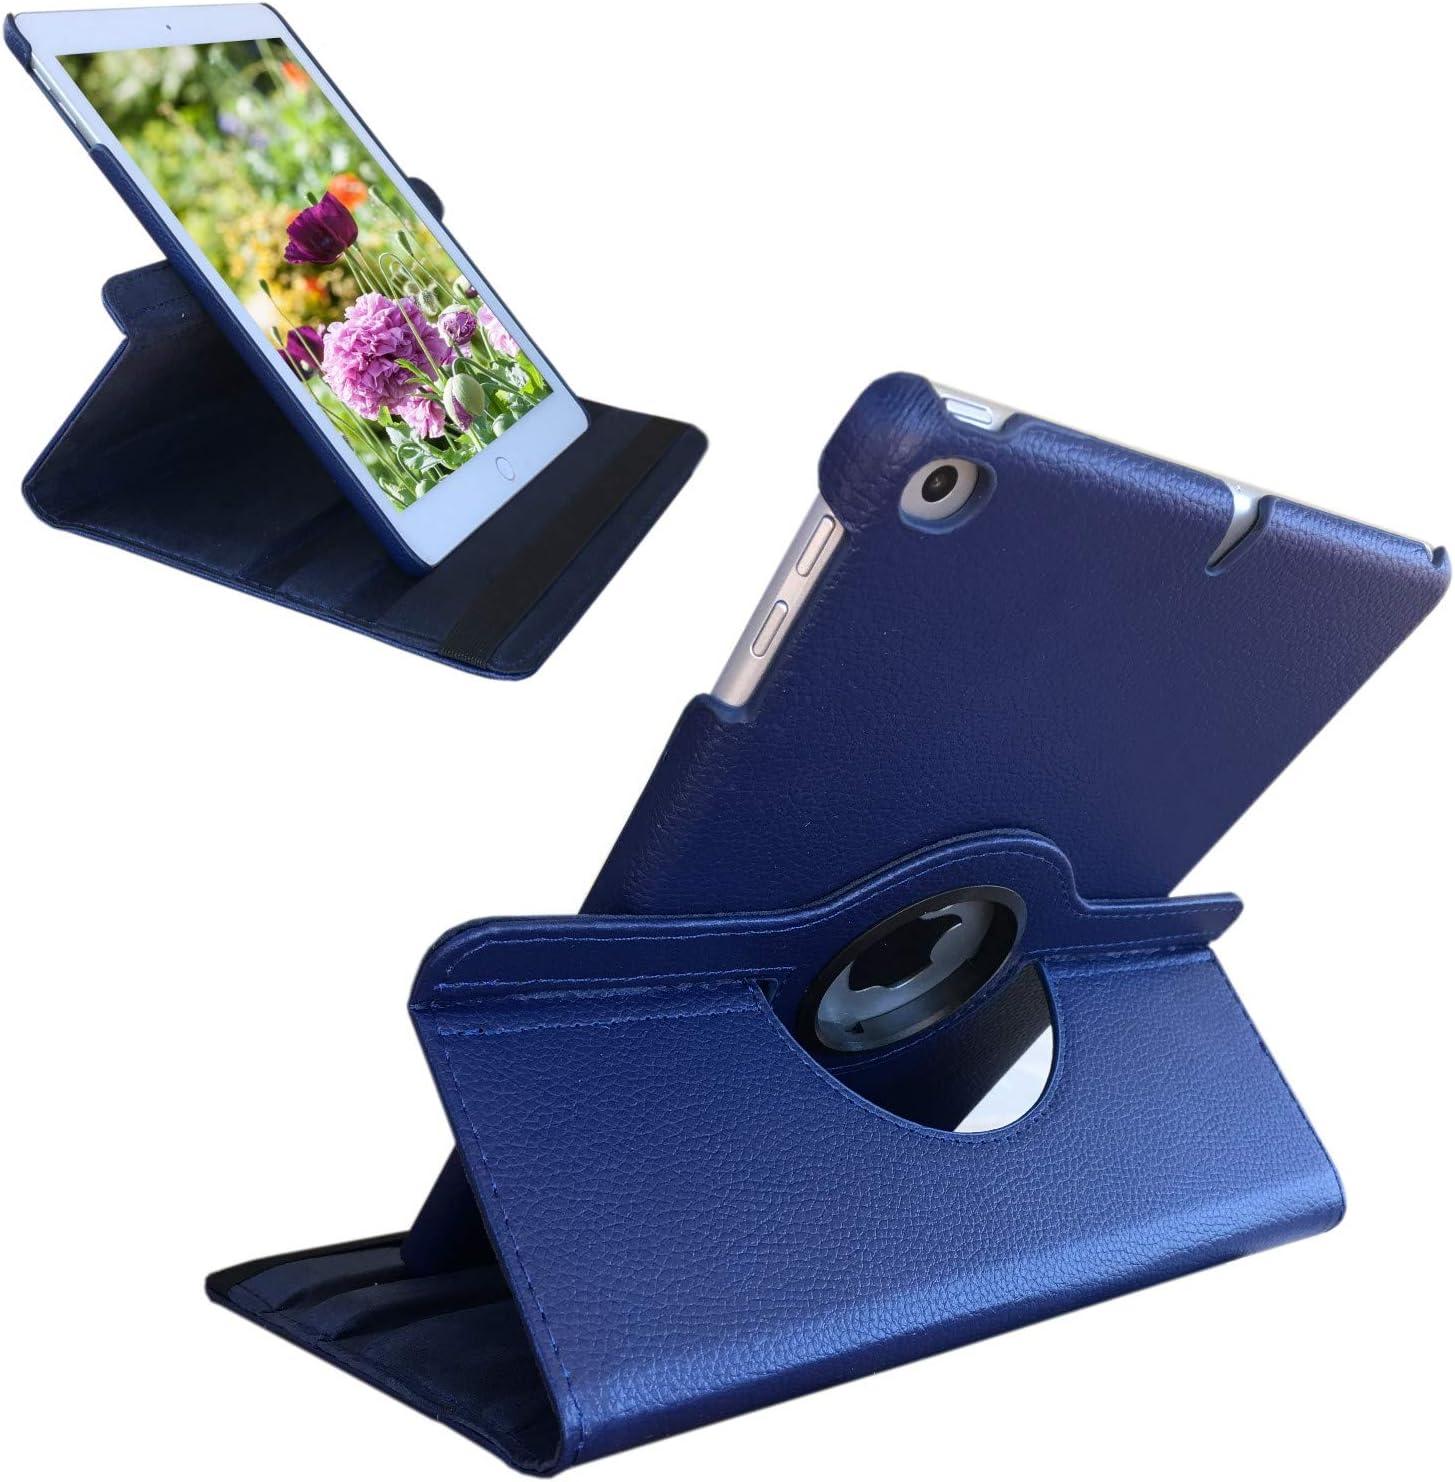 Estuche Trendmart para  iPad Air 1 A1474 A1475A1476 Azul